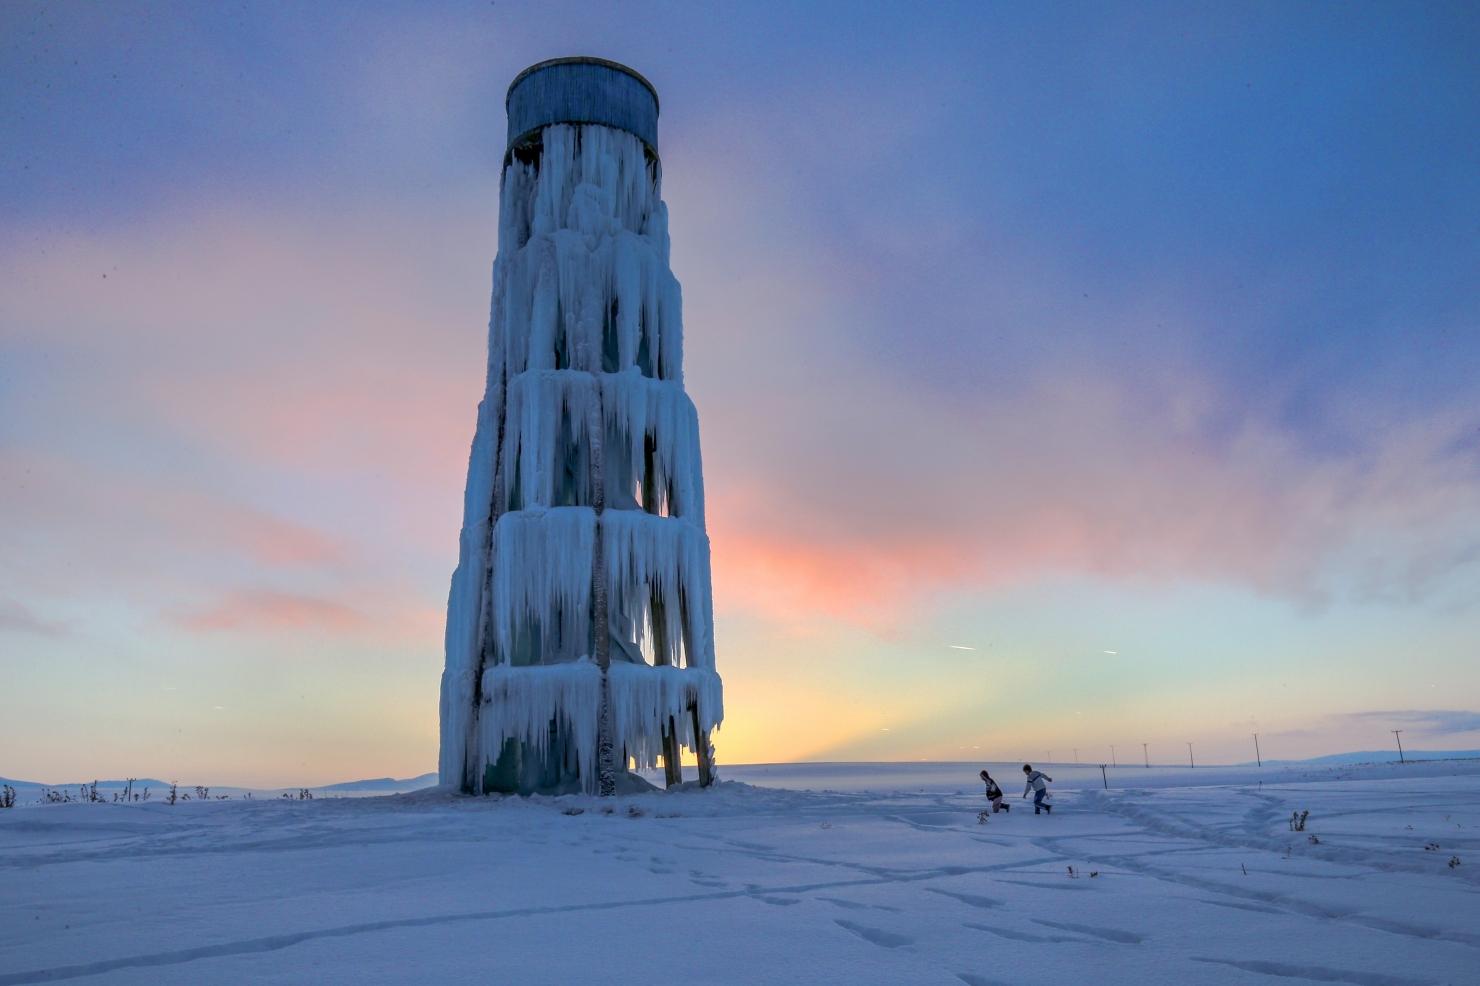 Turnul înghețat